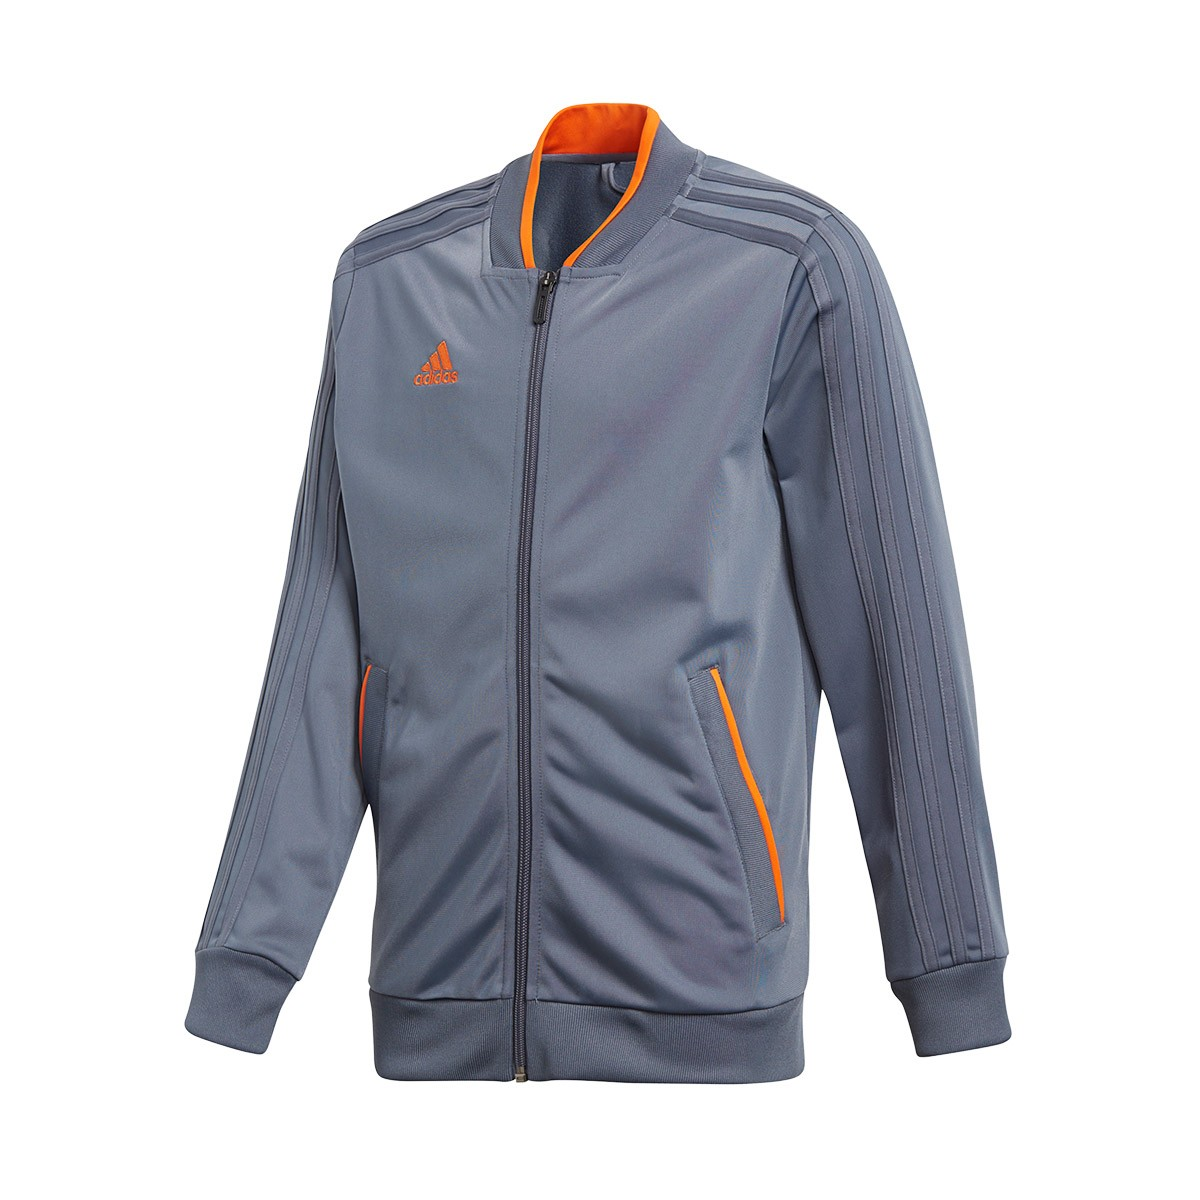 Chaqueta Polyester 18 Orange Onix Condivo qMGUpSVz